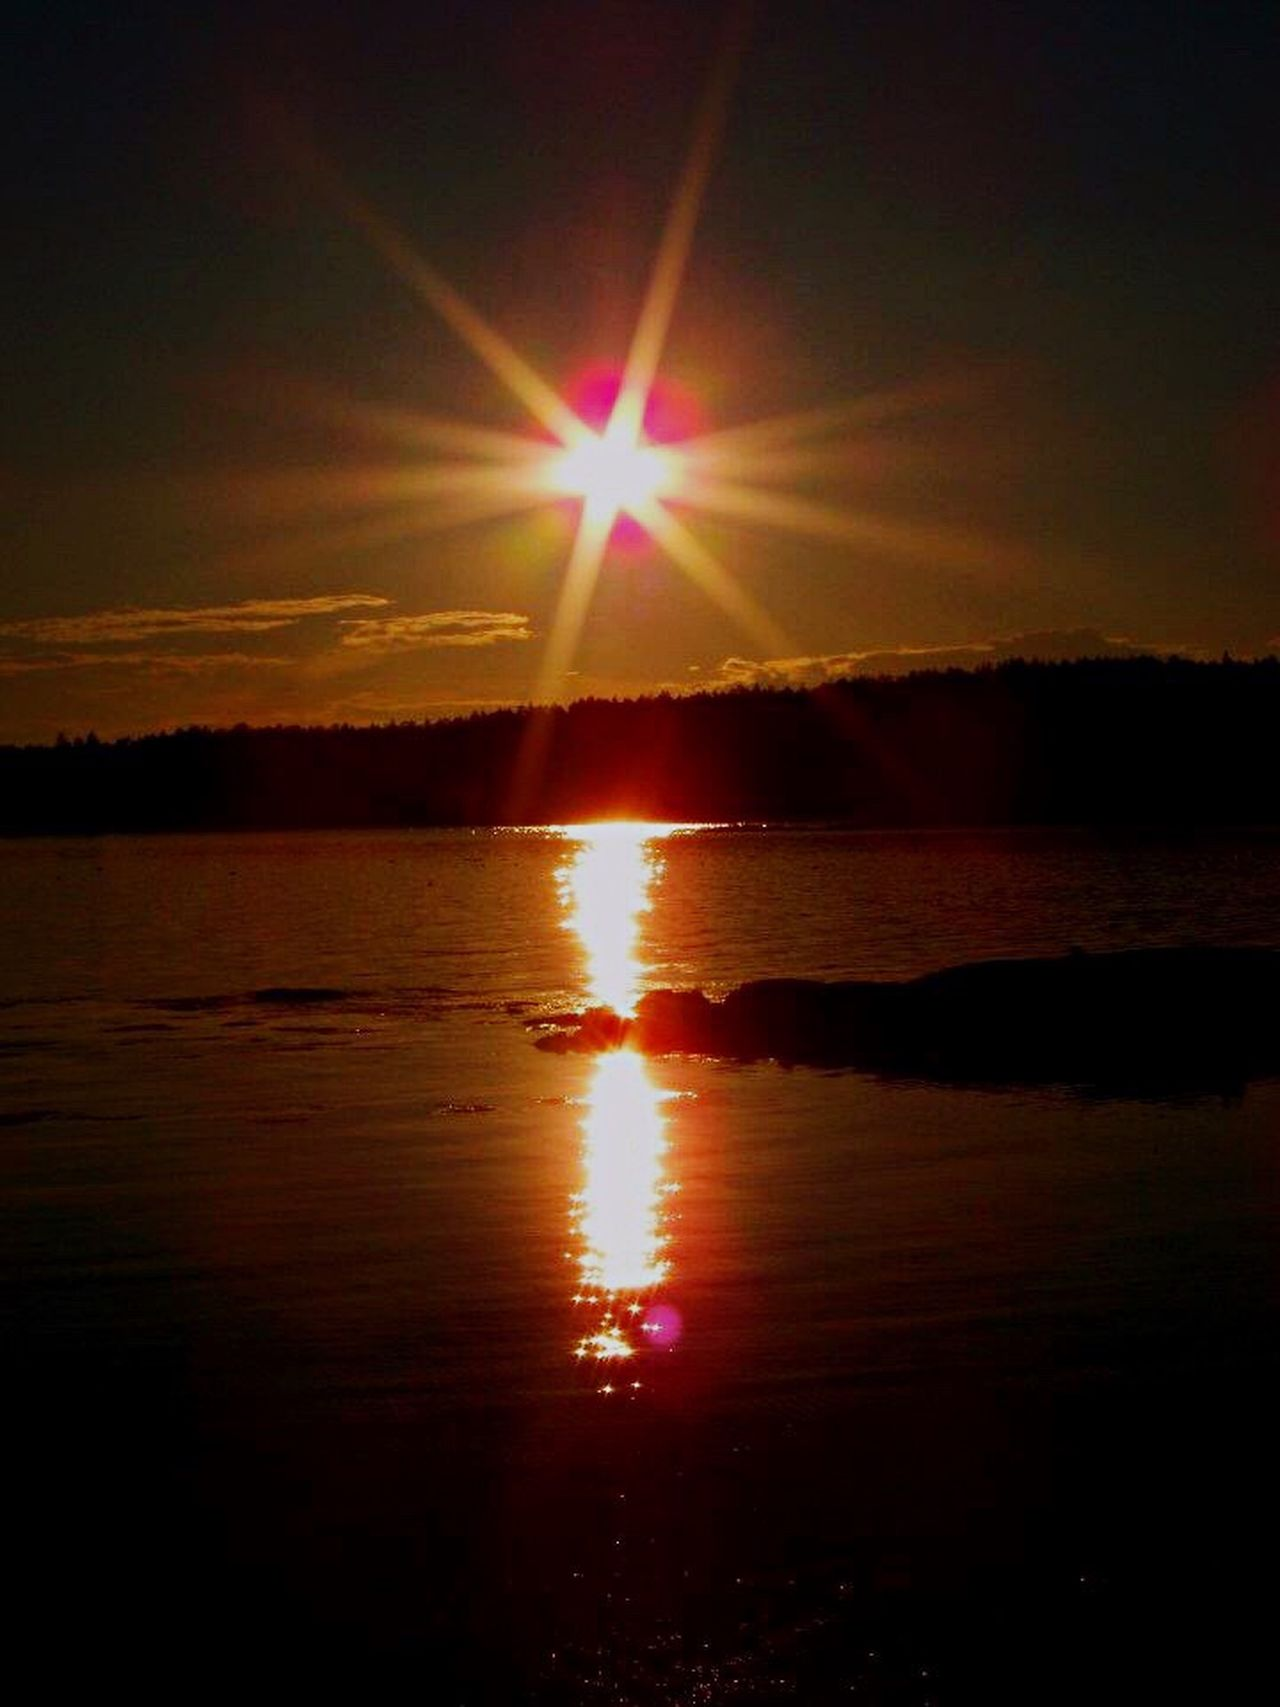 Ocean on fire Sunset Beauty In Nature Lens Flare Reflection Sunlight Seascape Ocean On Fire